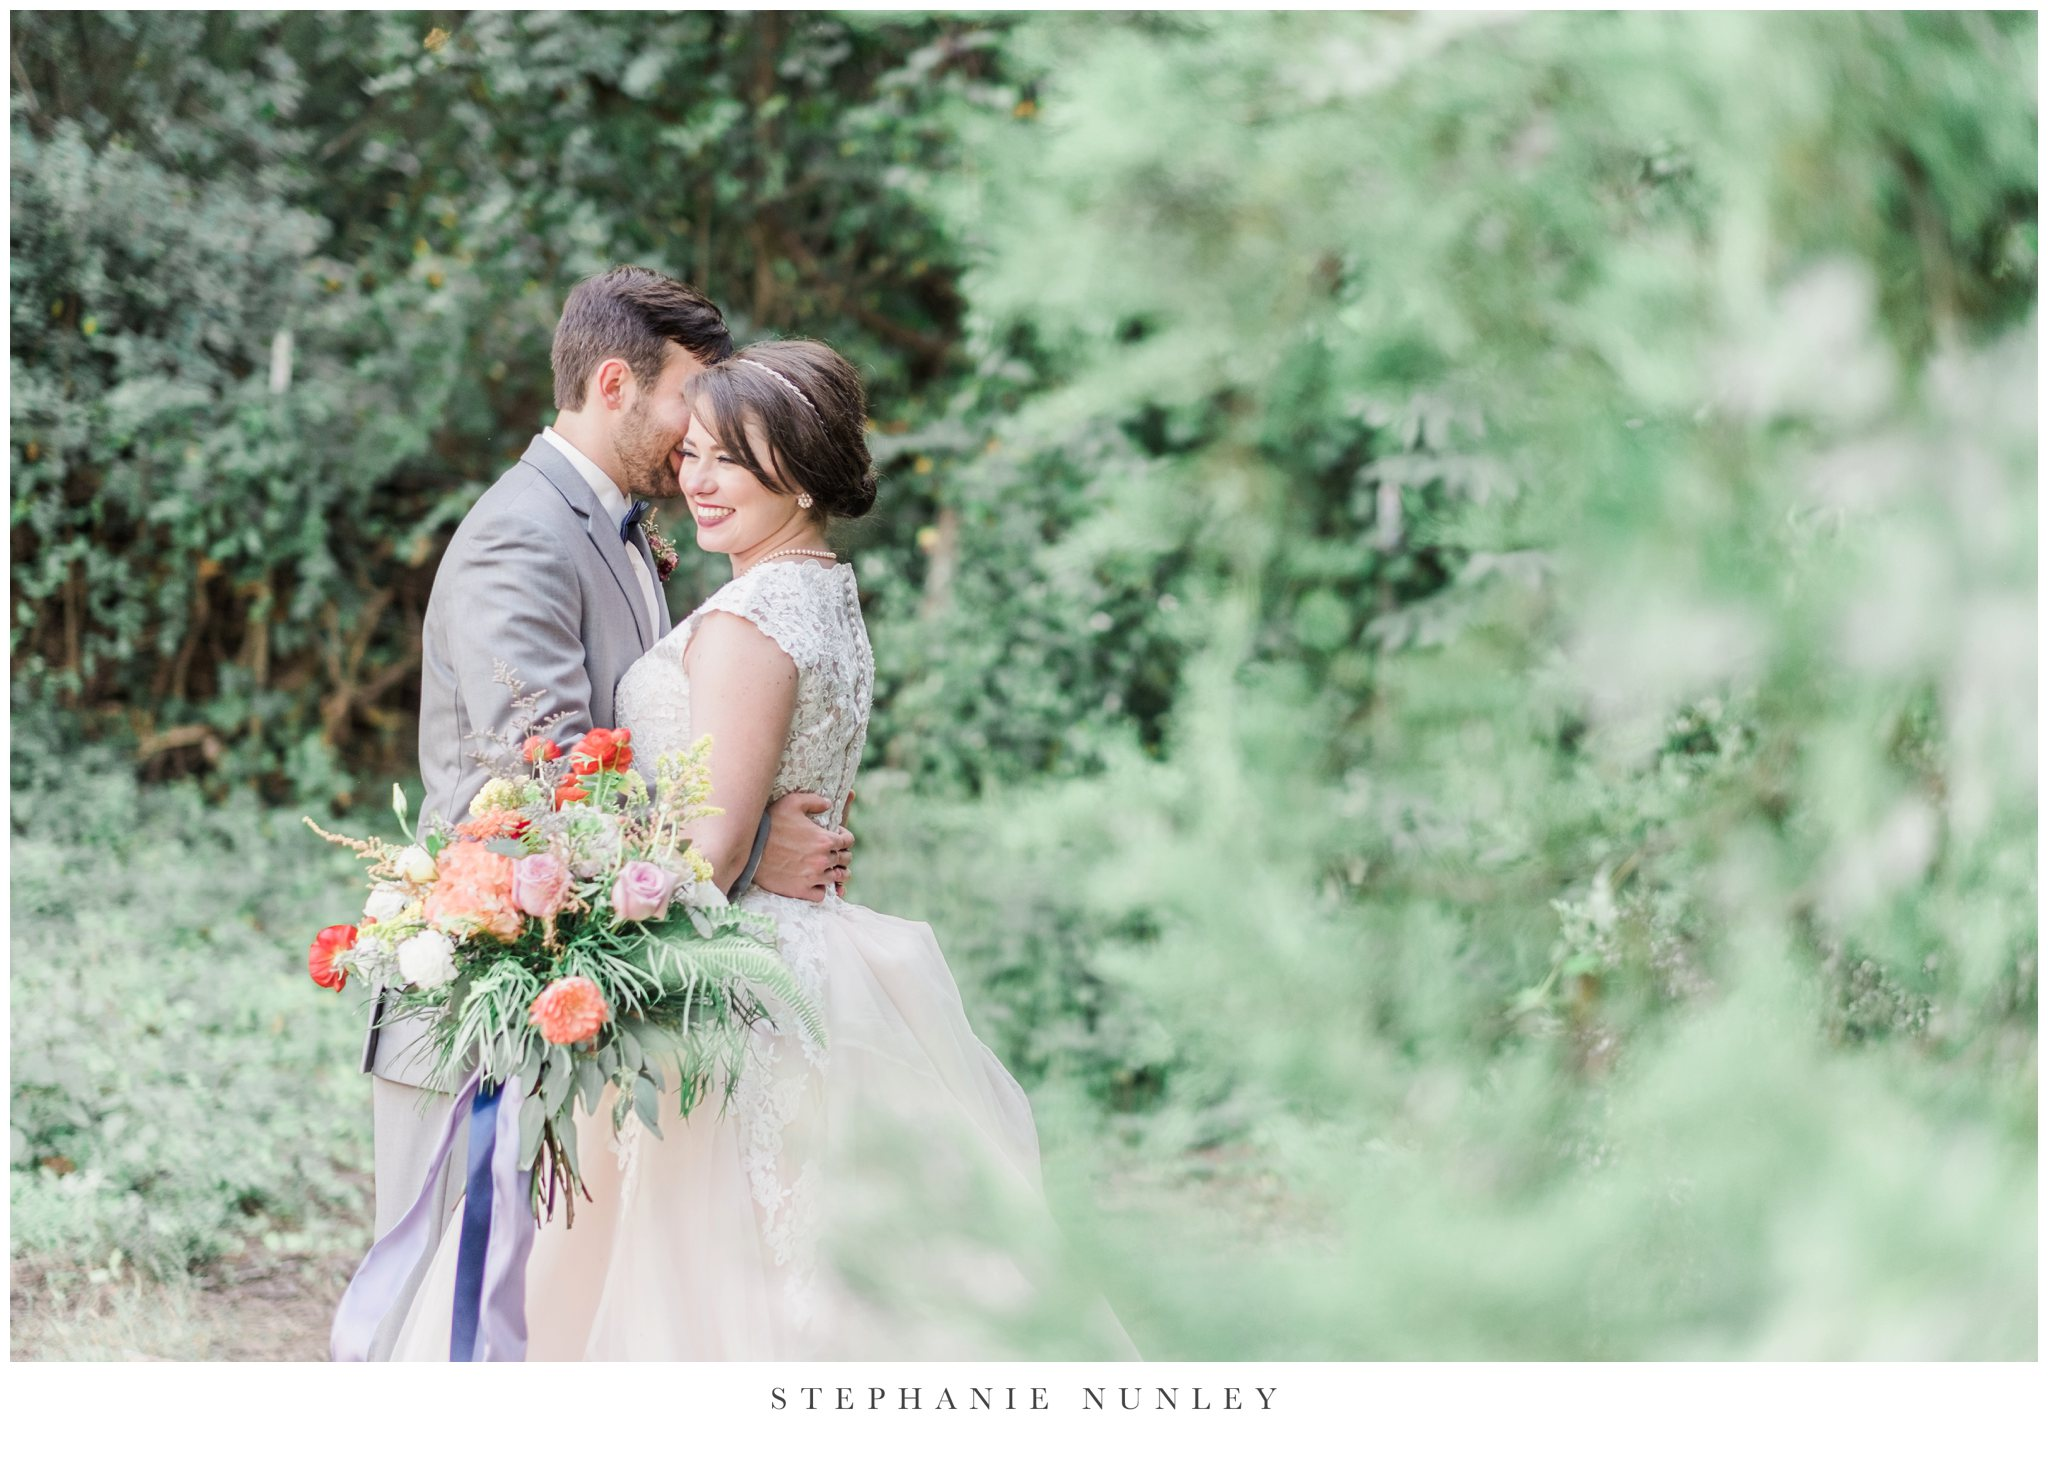 arkansas-wedding-with-lush-wildflower-bouquet-0139.jpg